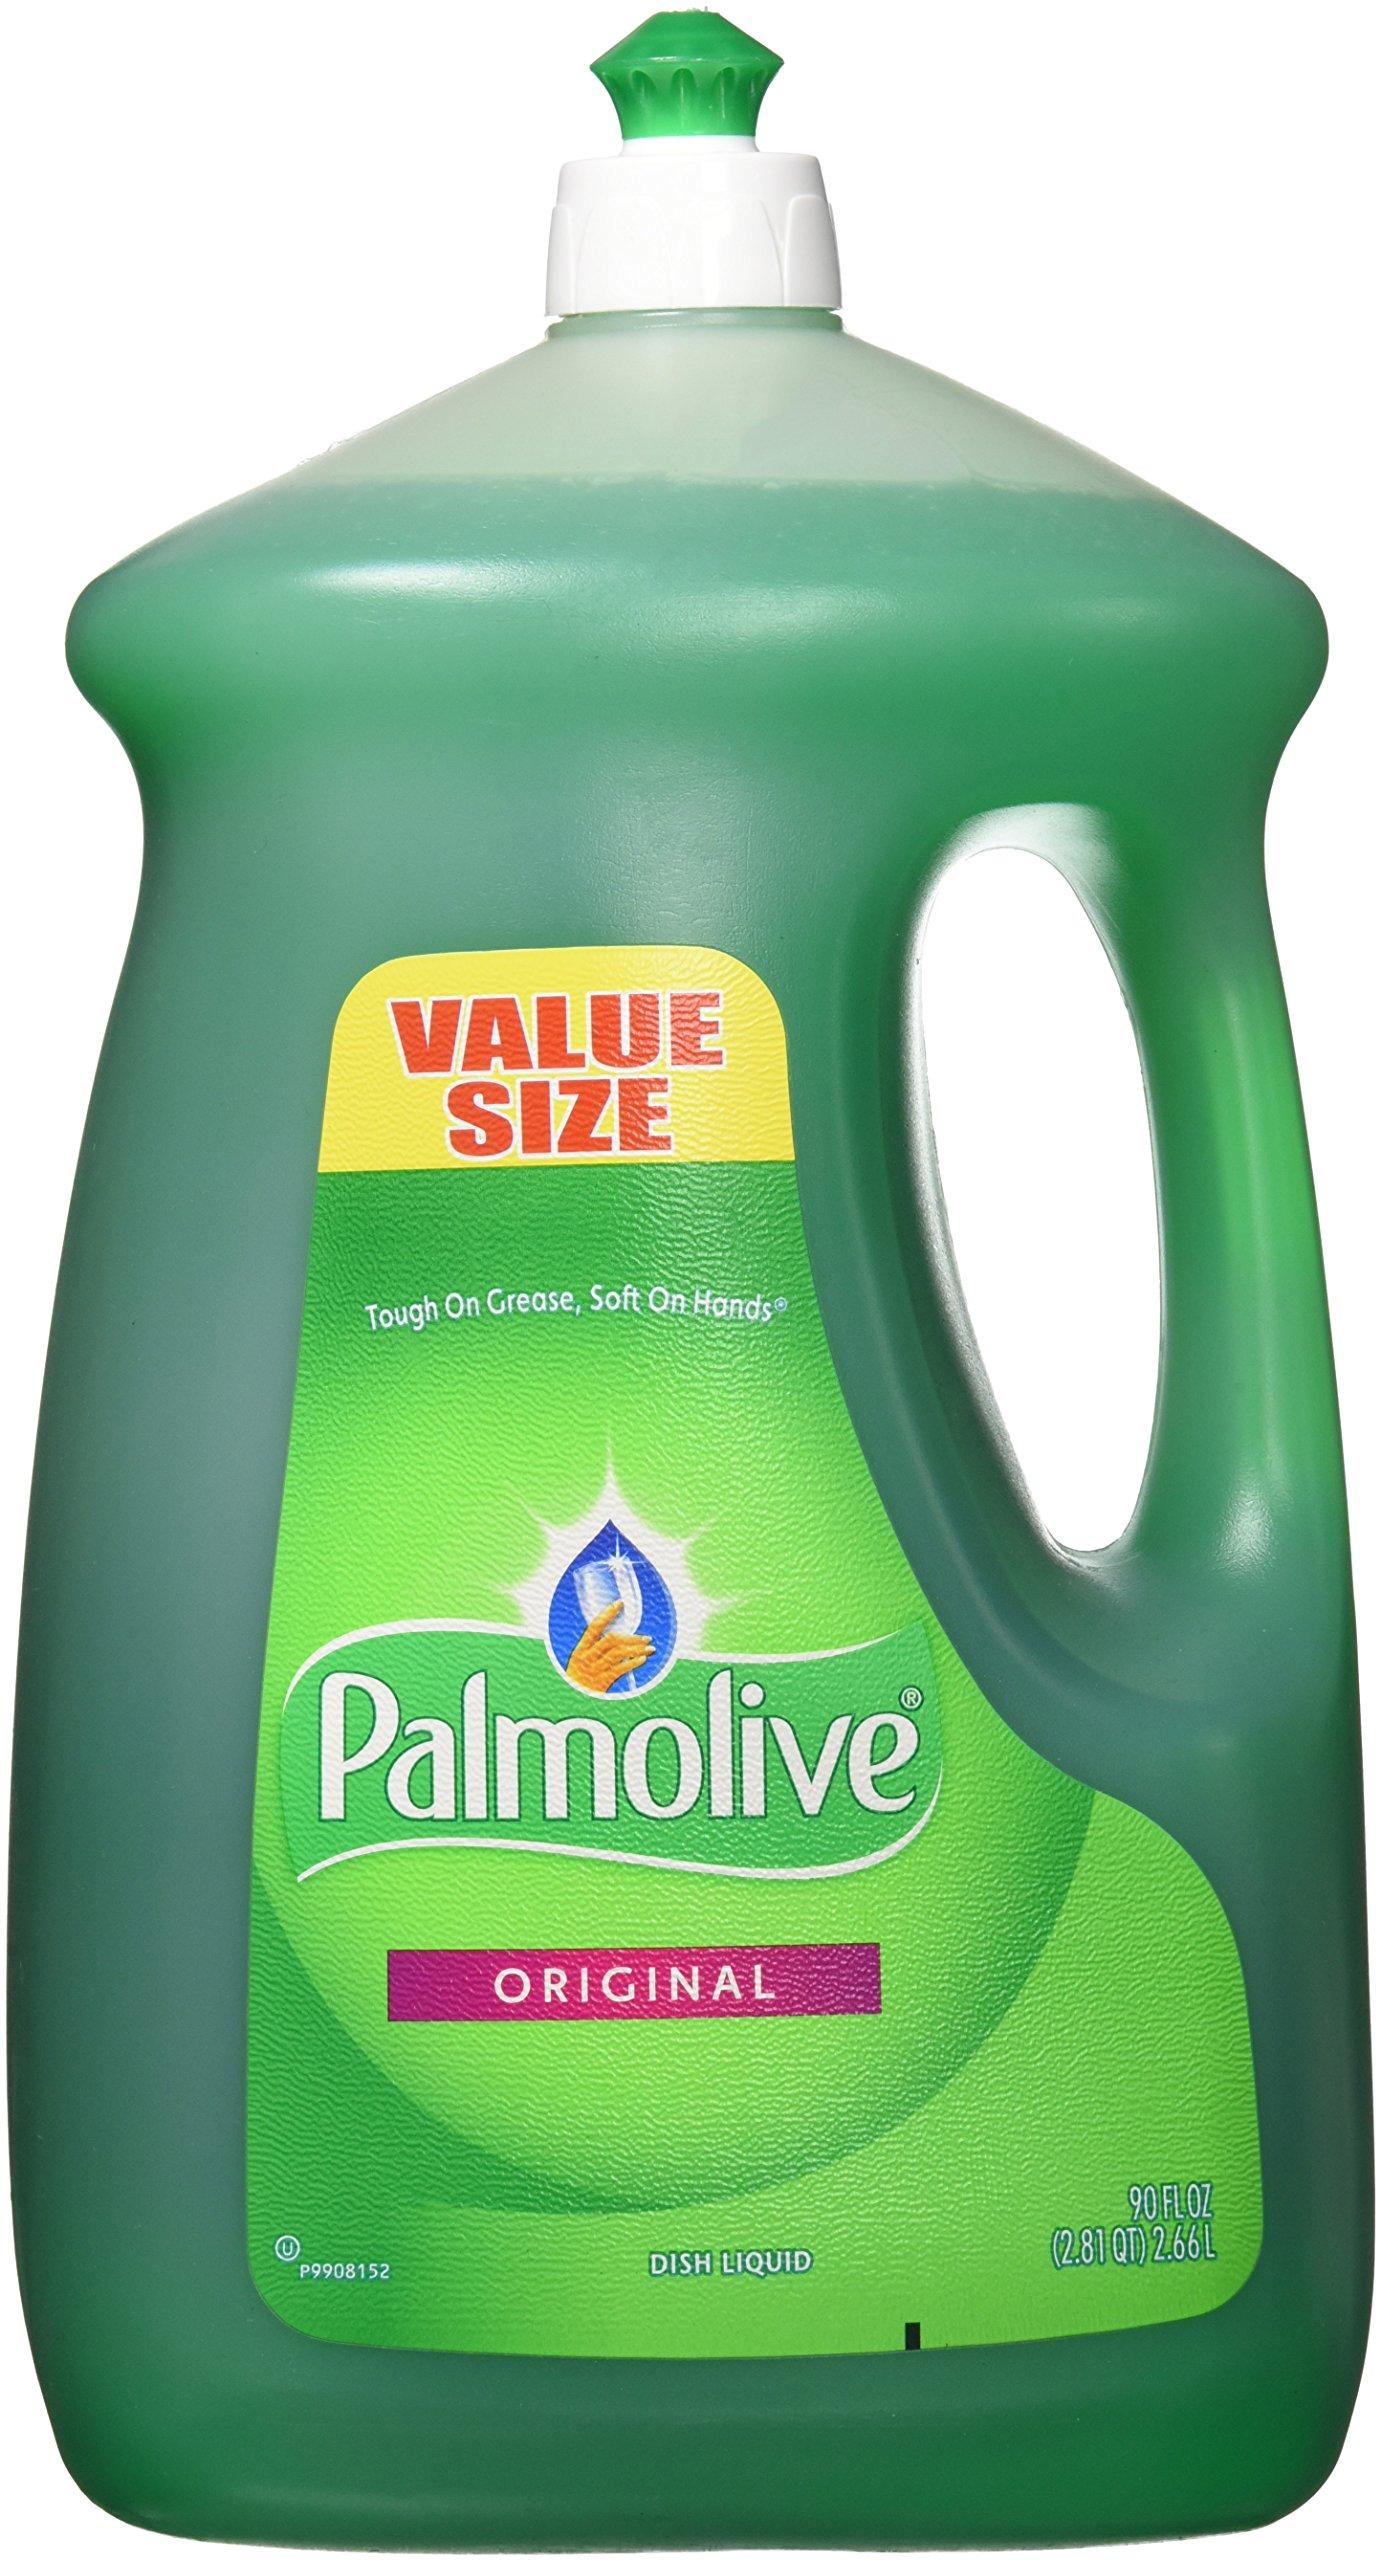 Palmolive Liquid Dish Soap, Original - 90 fluid ounce